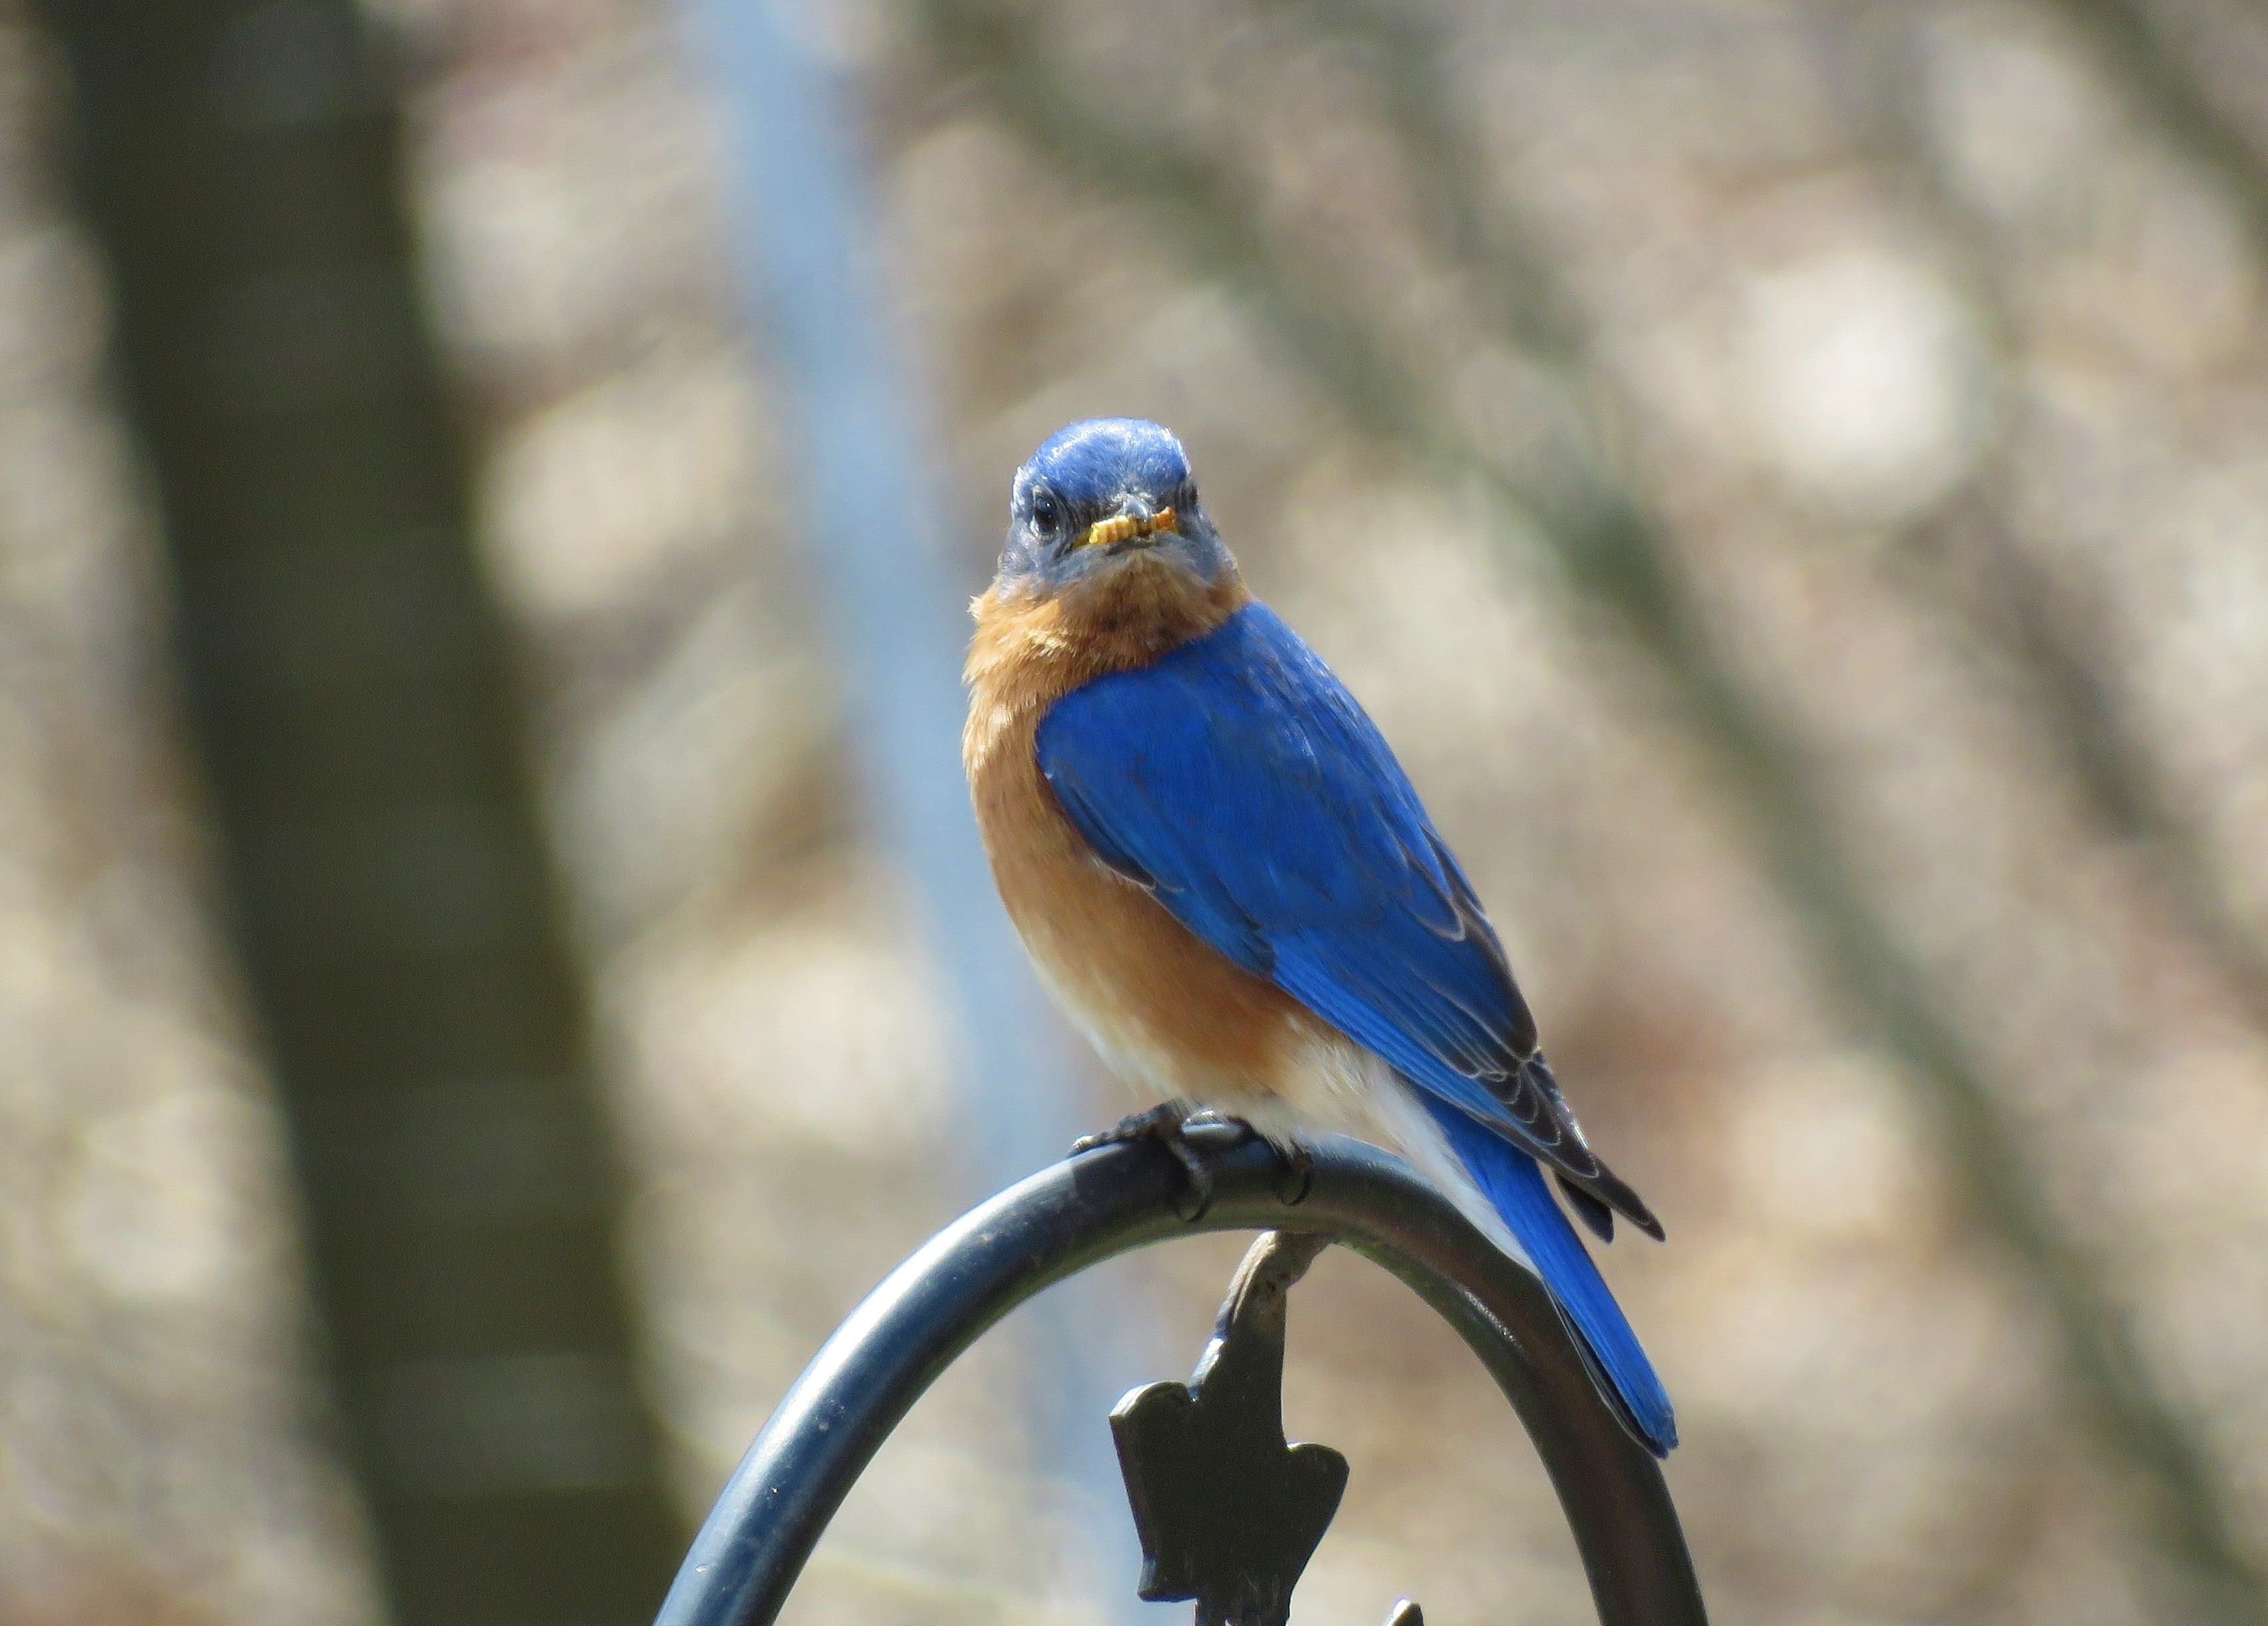 Eastern-bluebird-songbirds-birds-worms-mealworms-animals-wildlife